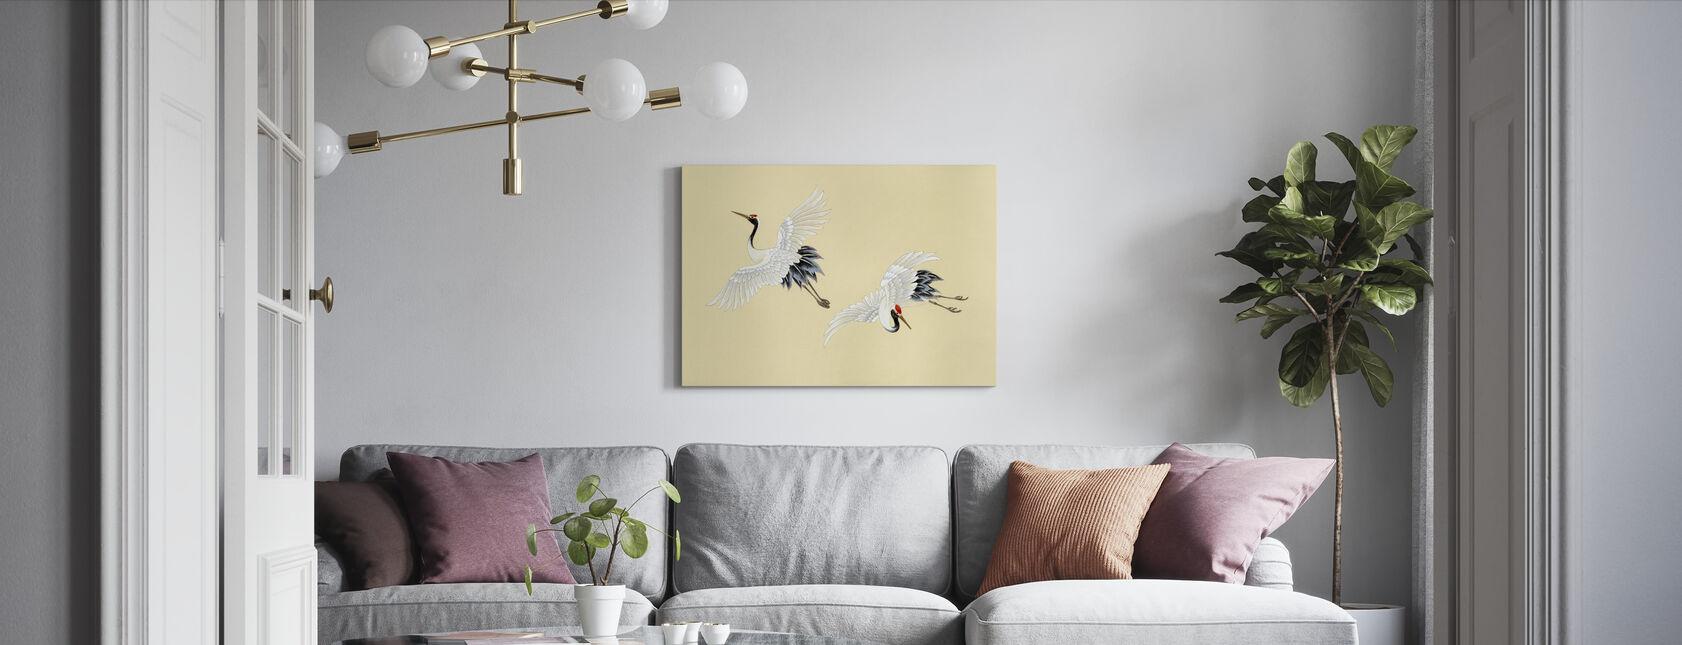 Twee Kranen - Canvas print - Woonkamer